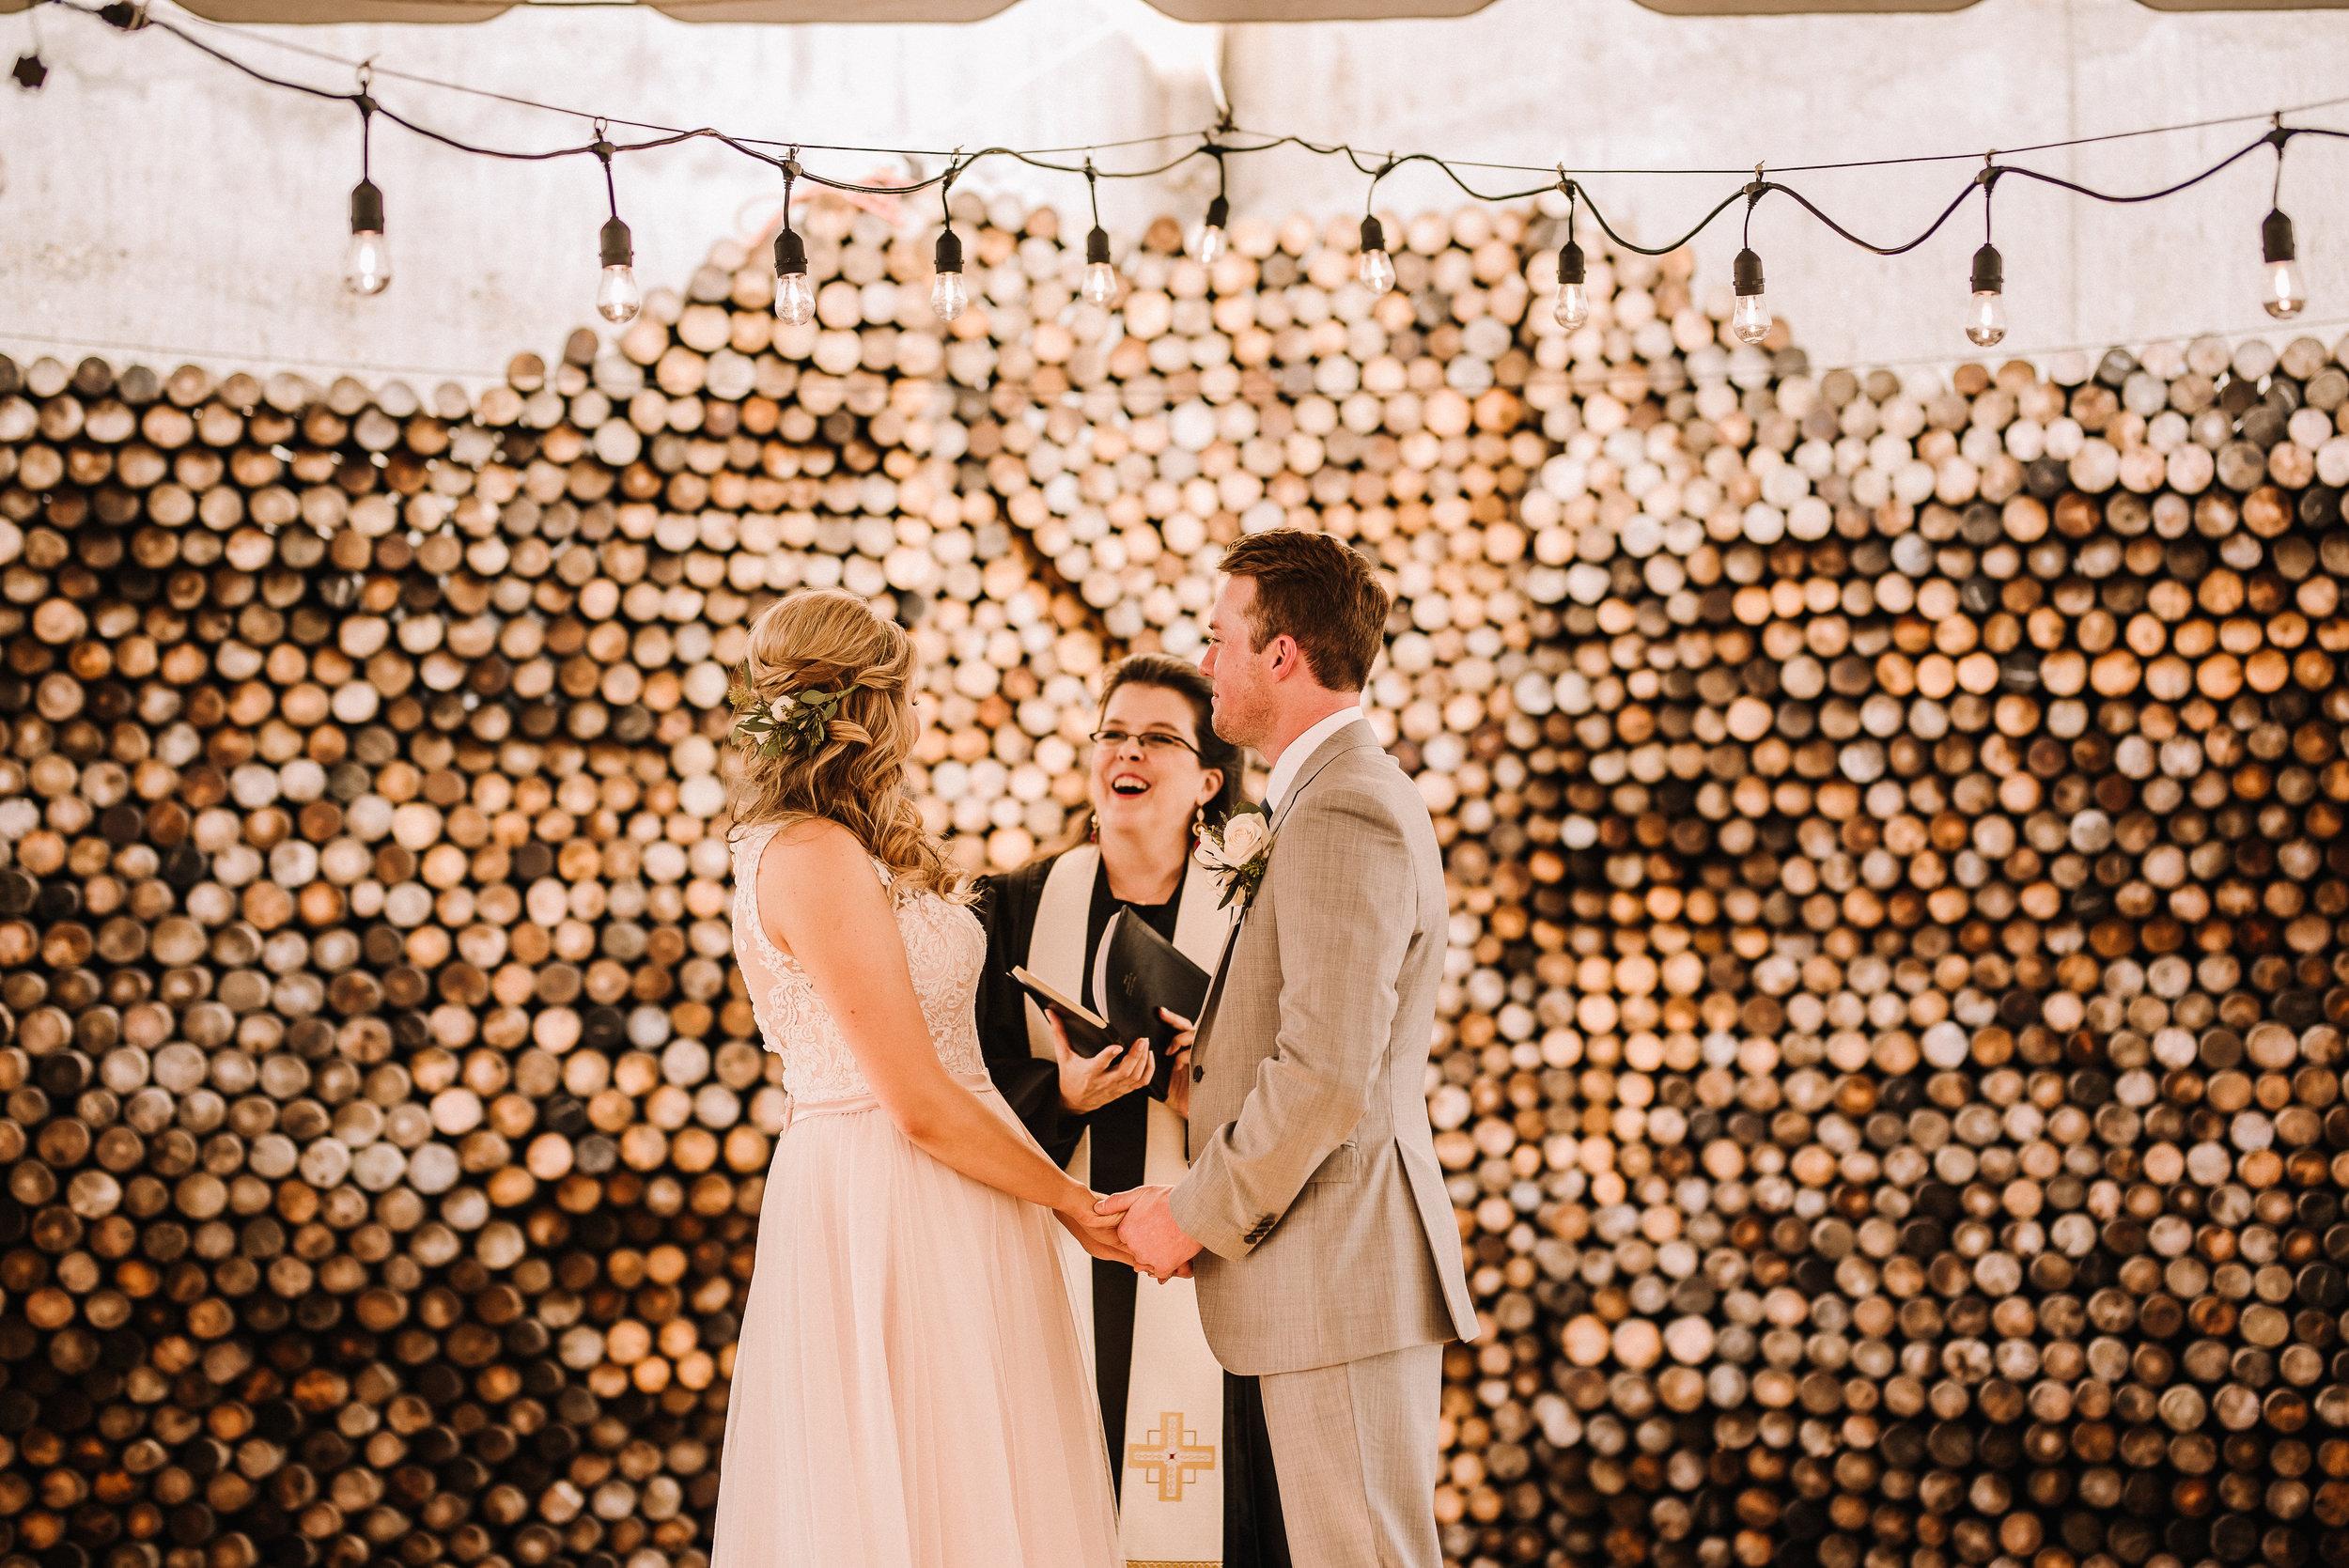 Pearson-Wiseacre-Wedding_Ashley-Benham-Photography (201 of 633).jpg